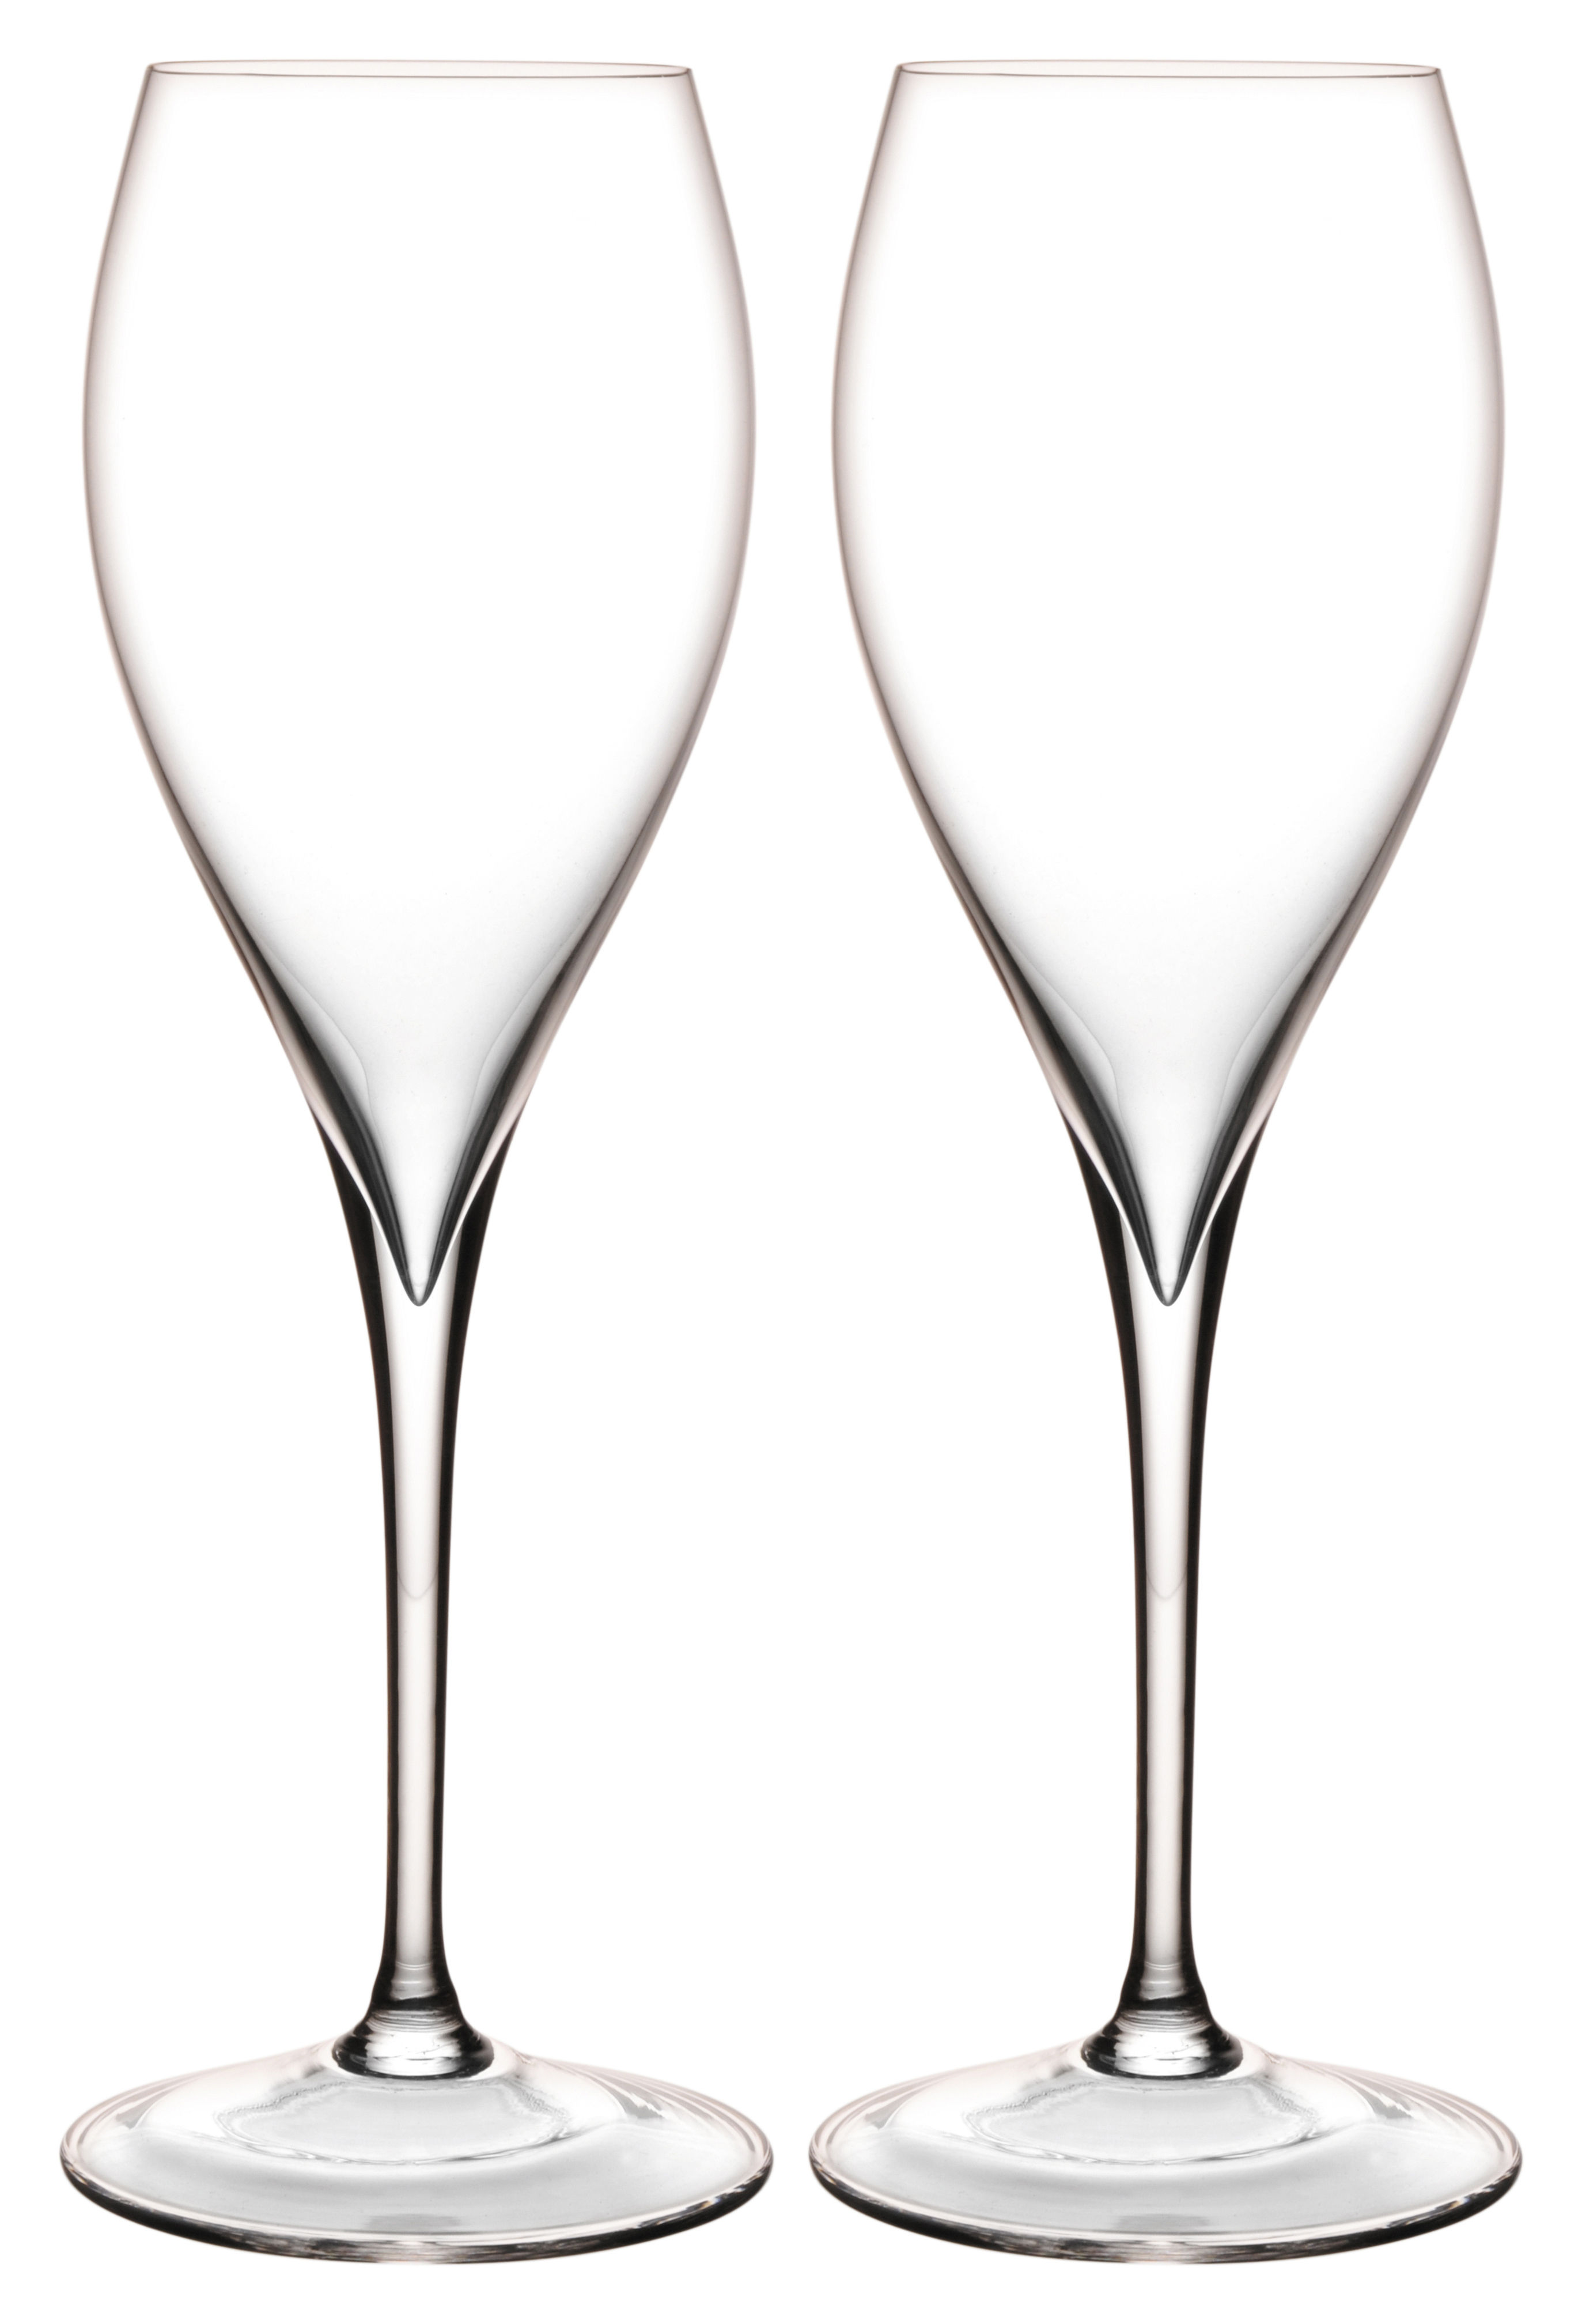 Tavola - Bicchieri  - Flûte da champagne Grand Piqué - set da 2 di L'Atelier du Vin - Trasparente - vetro soffiato